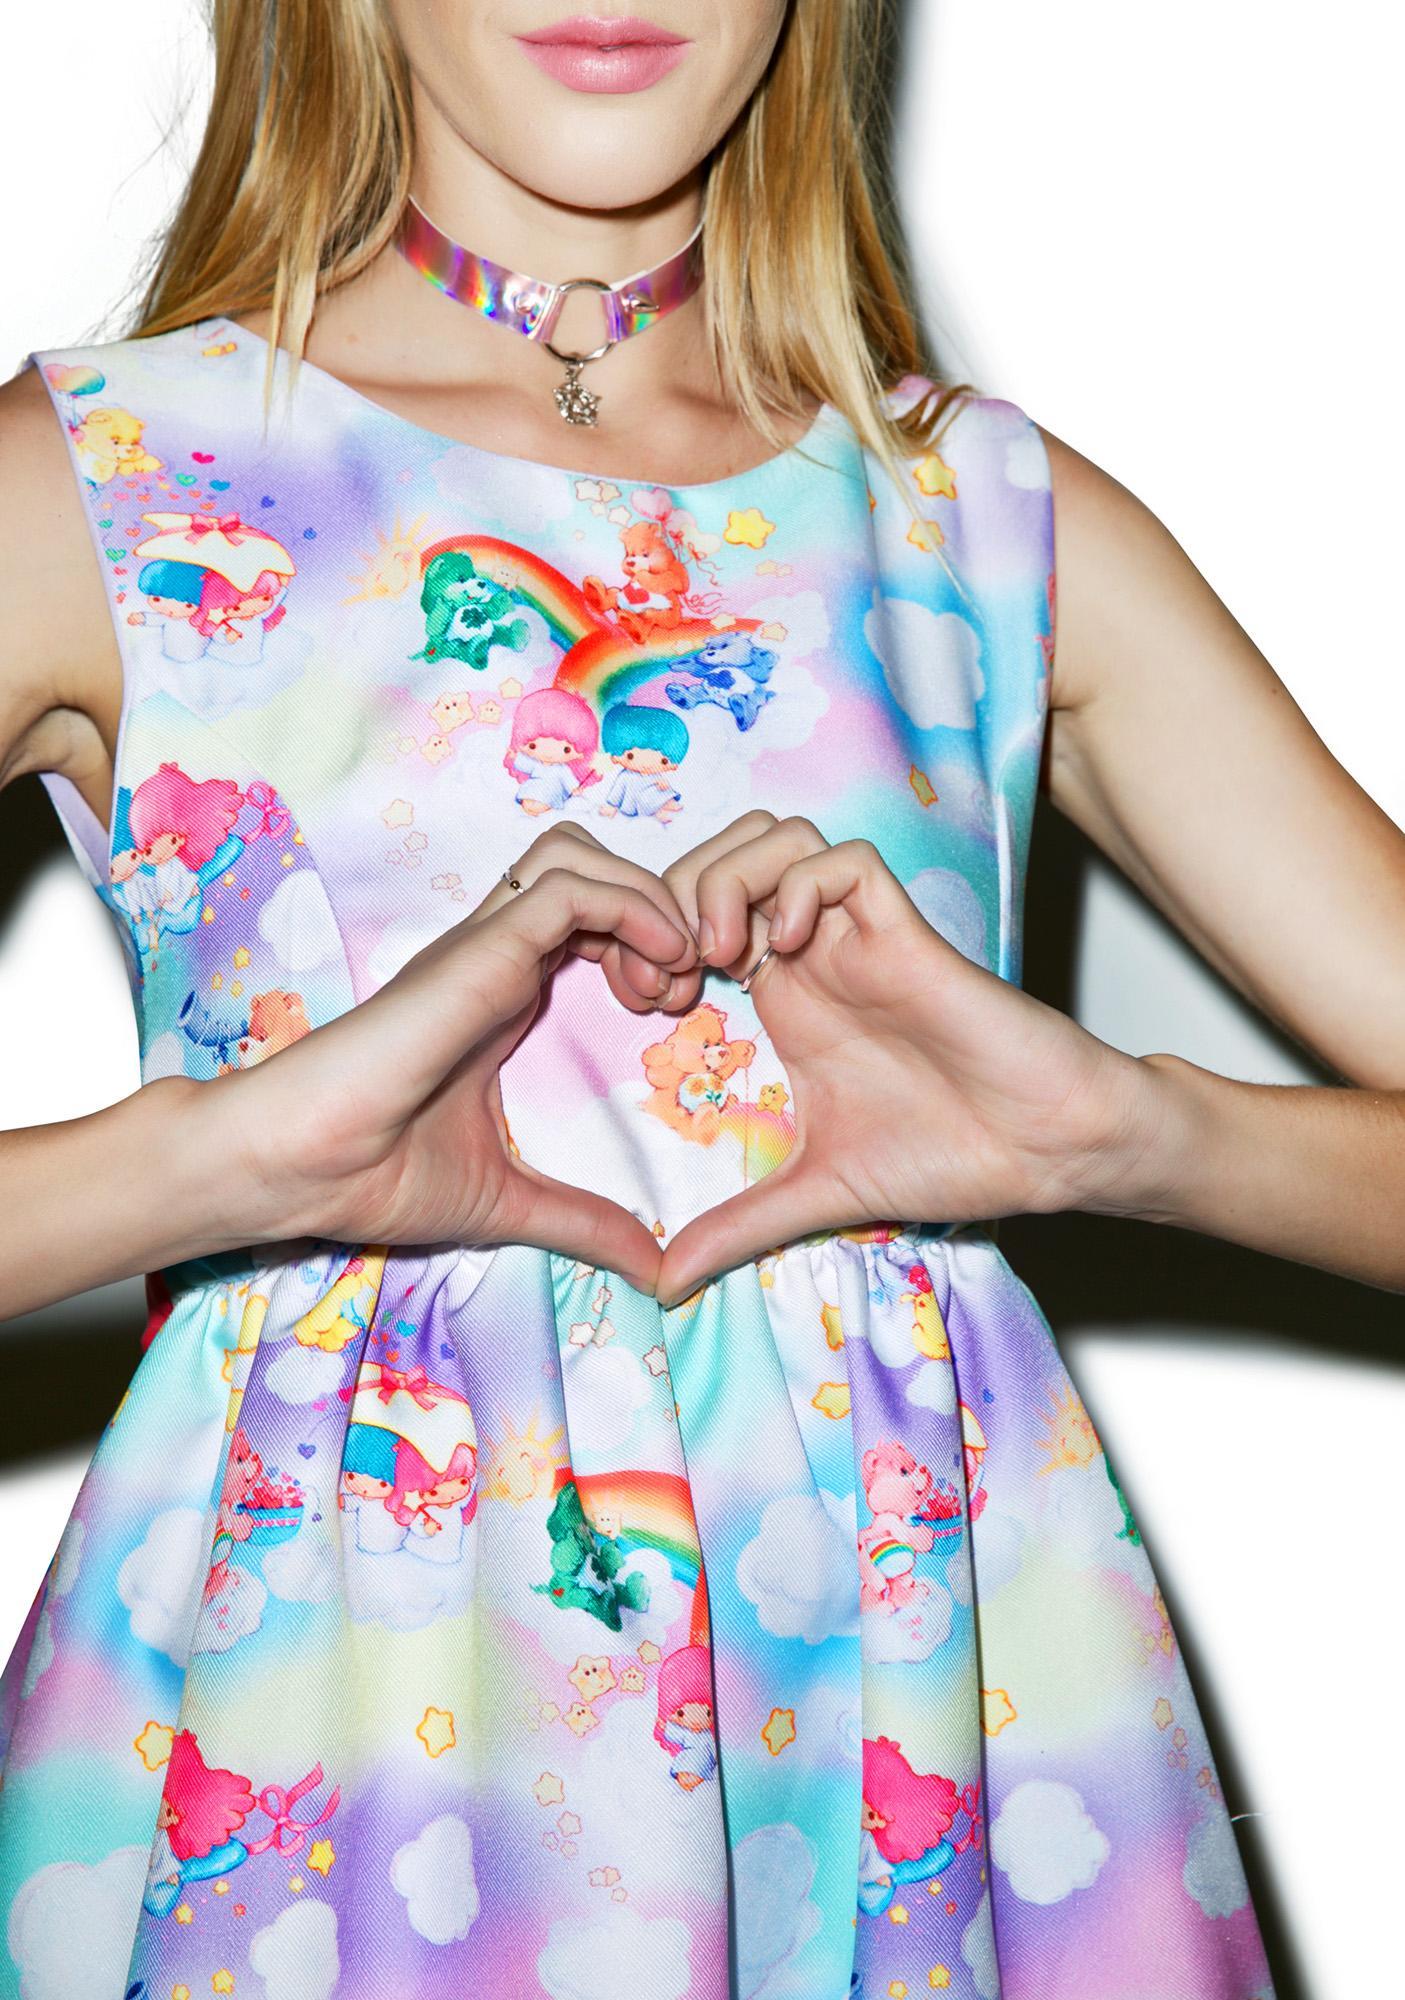 Japan L.A. Little Twin Stars X Care Bears Bow Back Dress